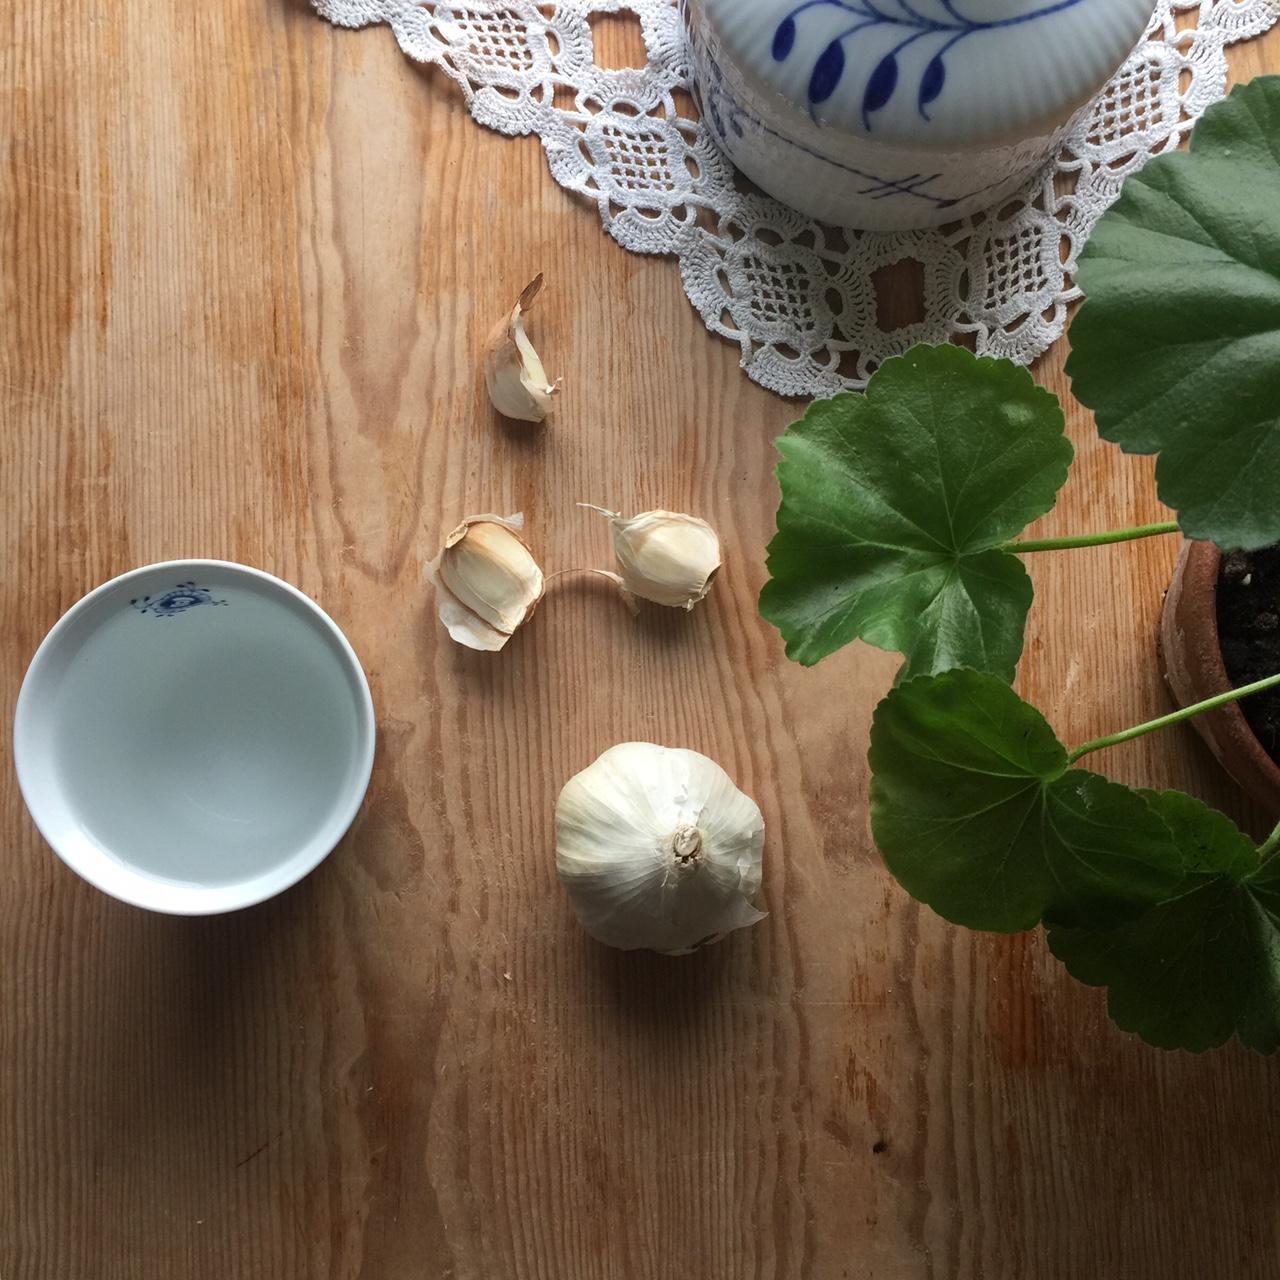 helse, hvitløk, helse hvitløk, sunt hvitløk, allicin, phytoncide, allicin garlic, phytoncide garlic, garlic benefits, hvitløk benefits, betennelsesdempende mat, inflammatory food,